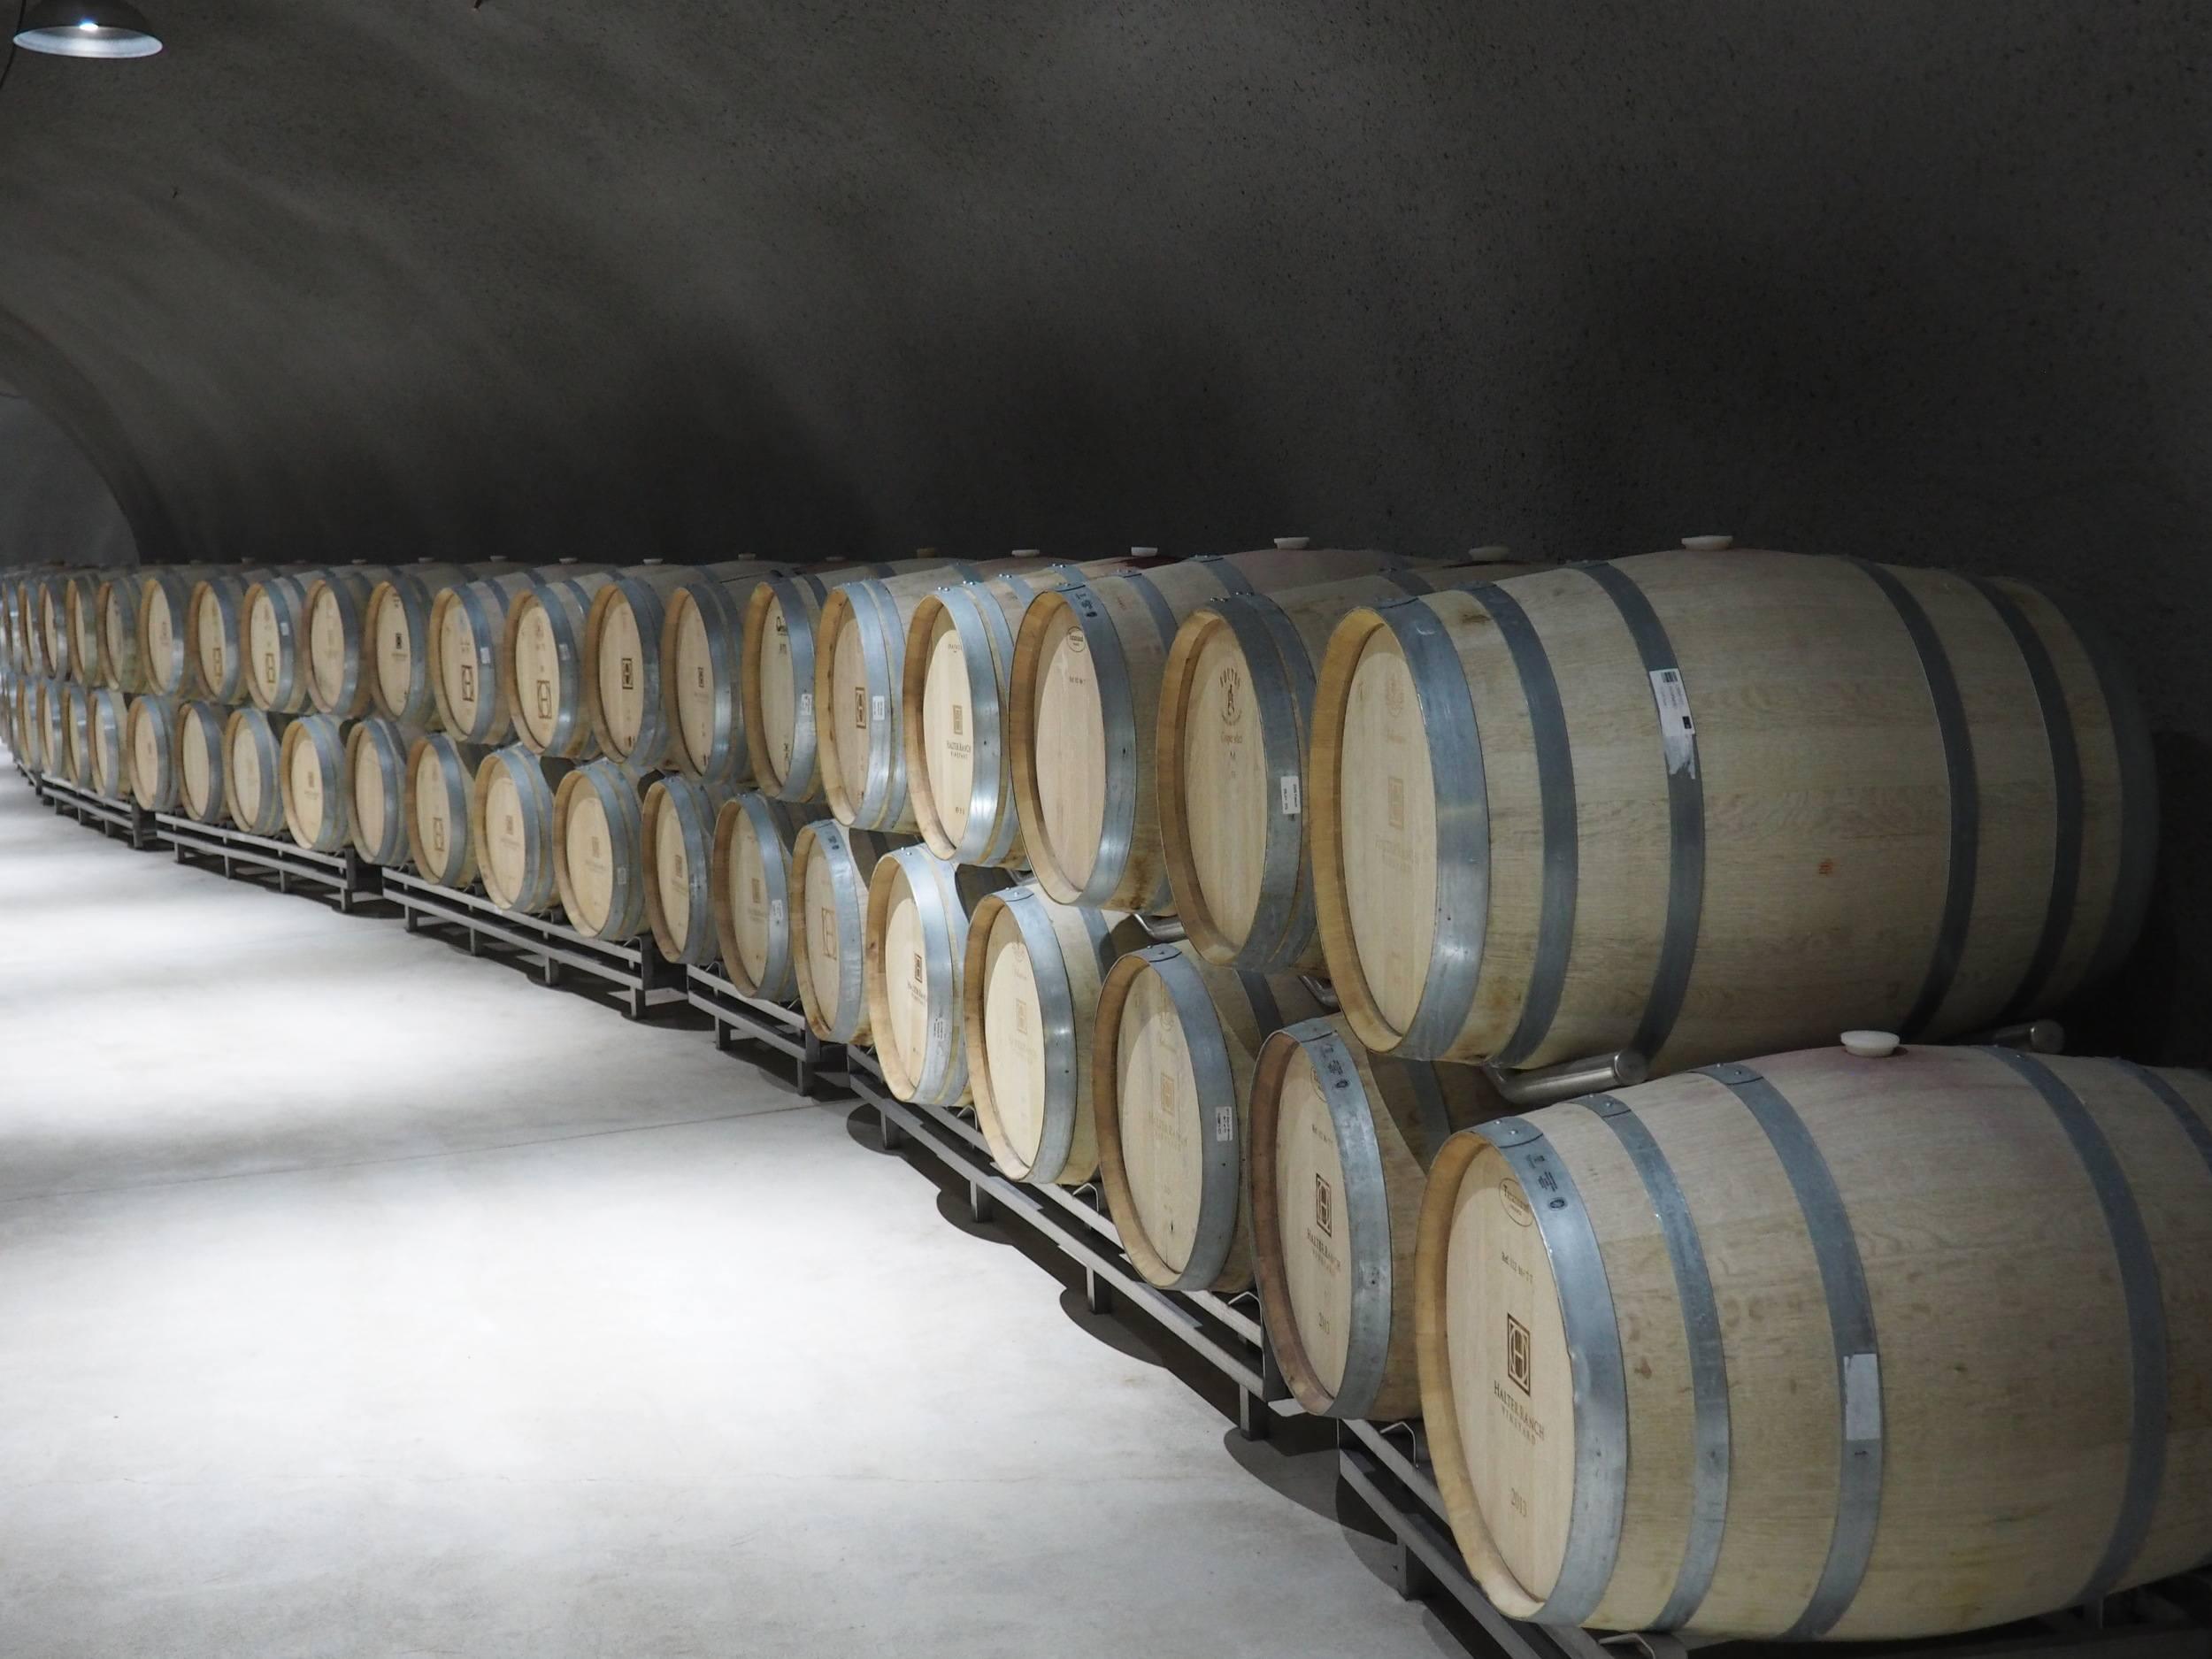 wine tasting in paso robles / barrel cellar in halter ranch vineyard excursion tour